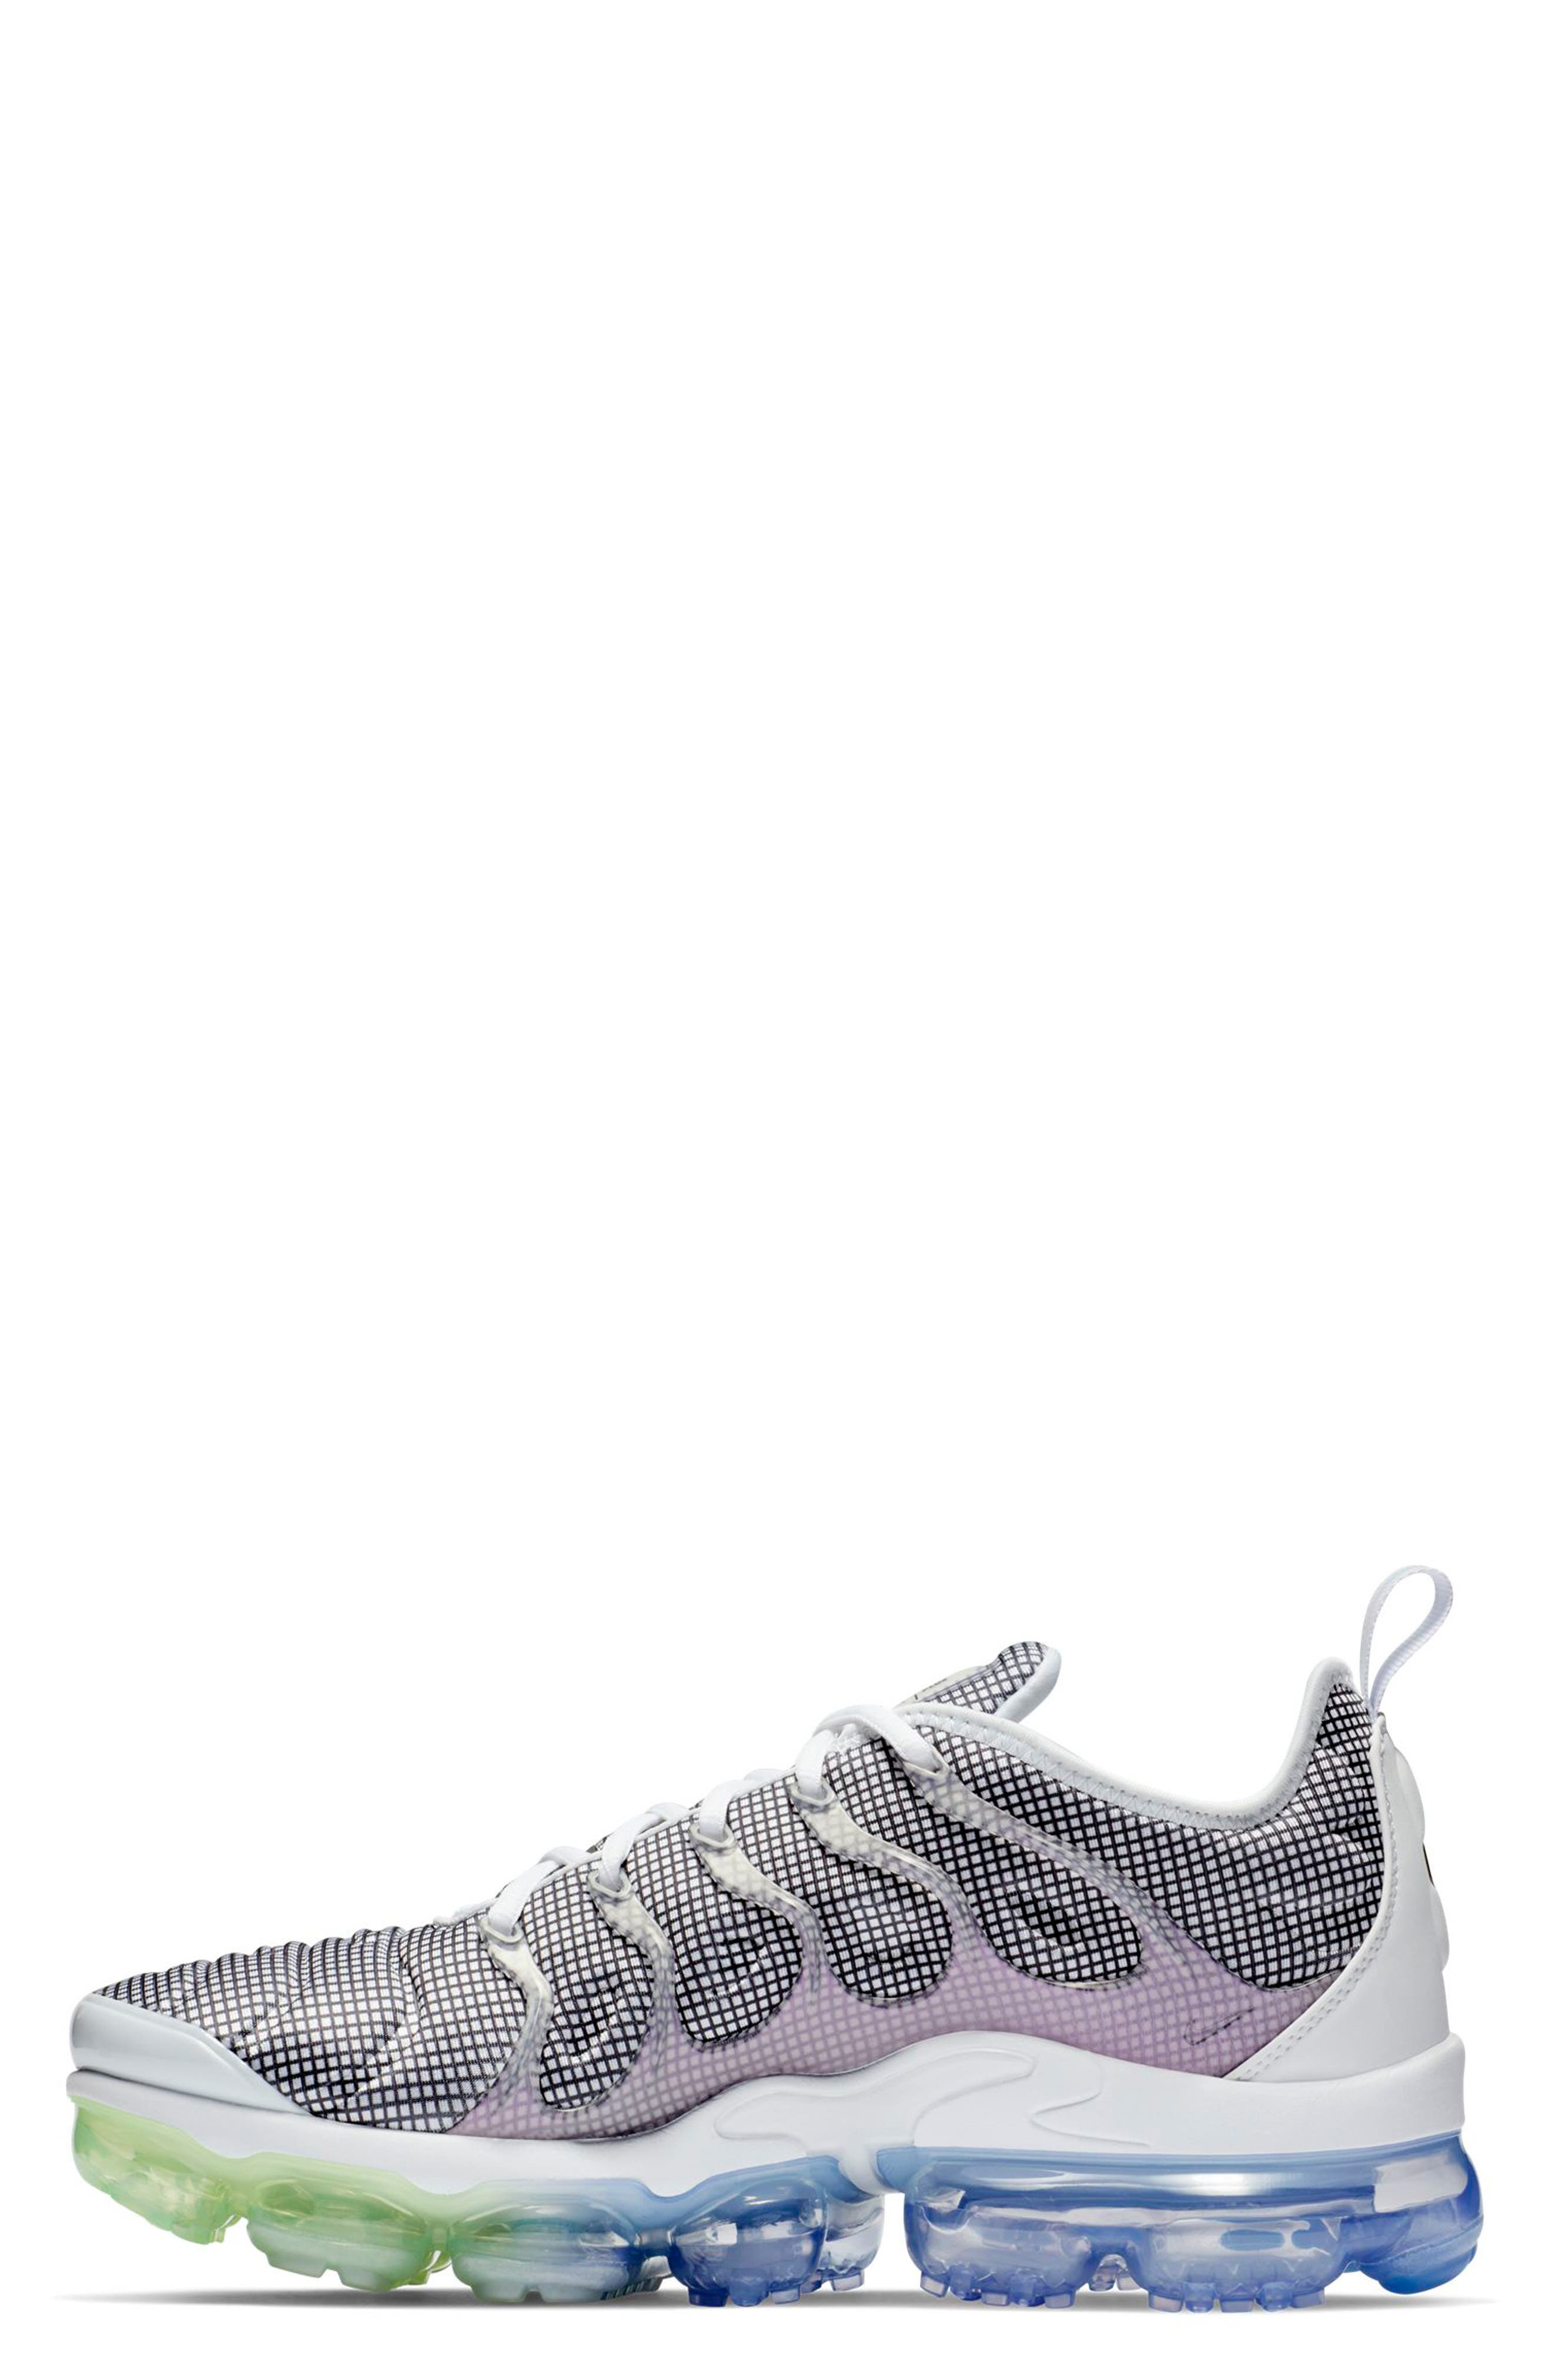 Air VaporMax Plus Sneaker,                             Alternate thumbnail 3, color,                             WHITE/ BLACK/ ALUMINUM/ VOLT